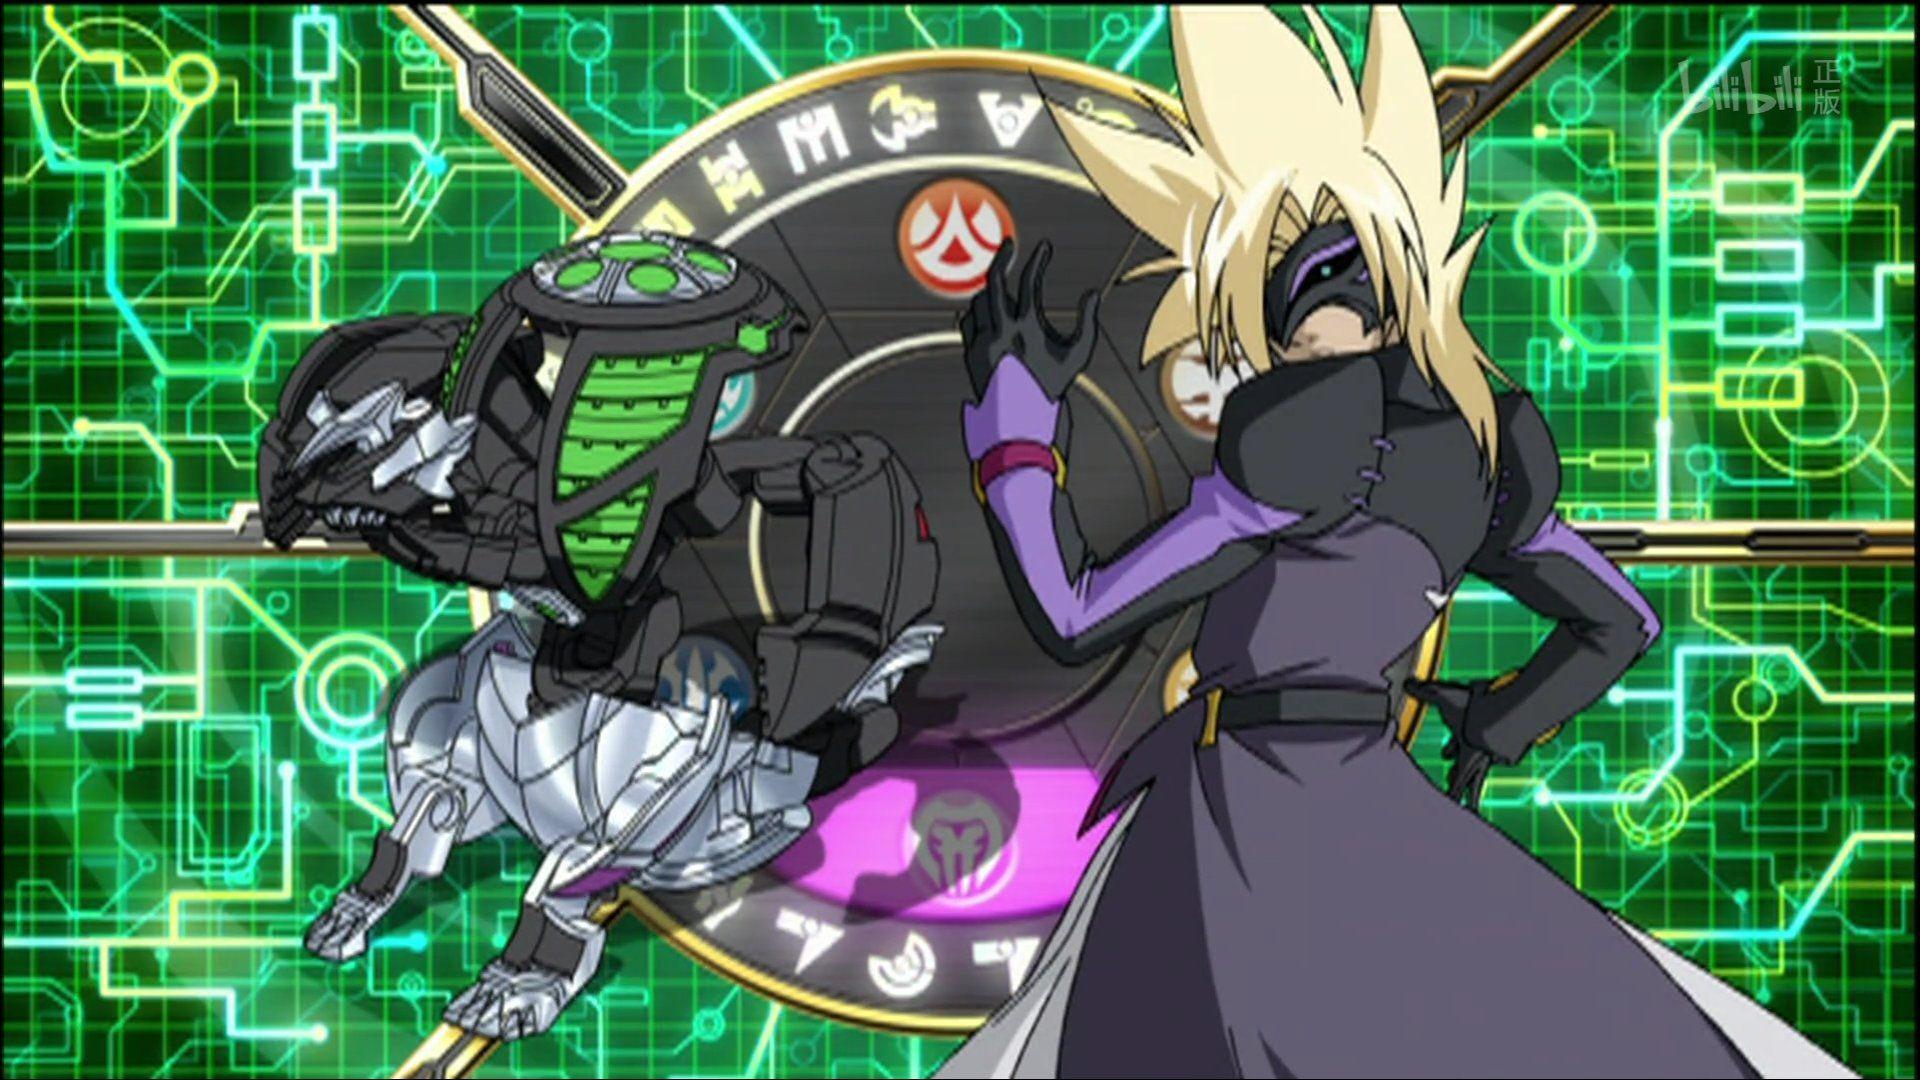 Pin by anime4ever on Bakugan battle brawlers in 2020